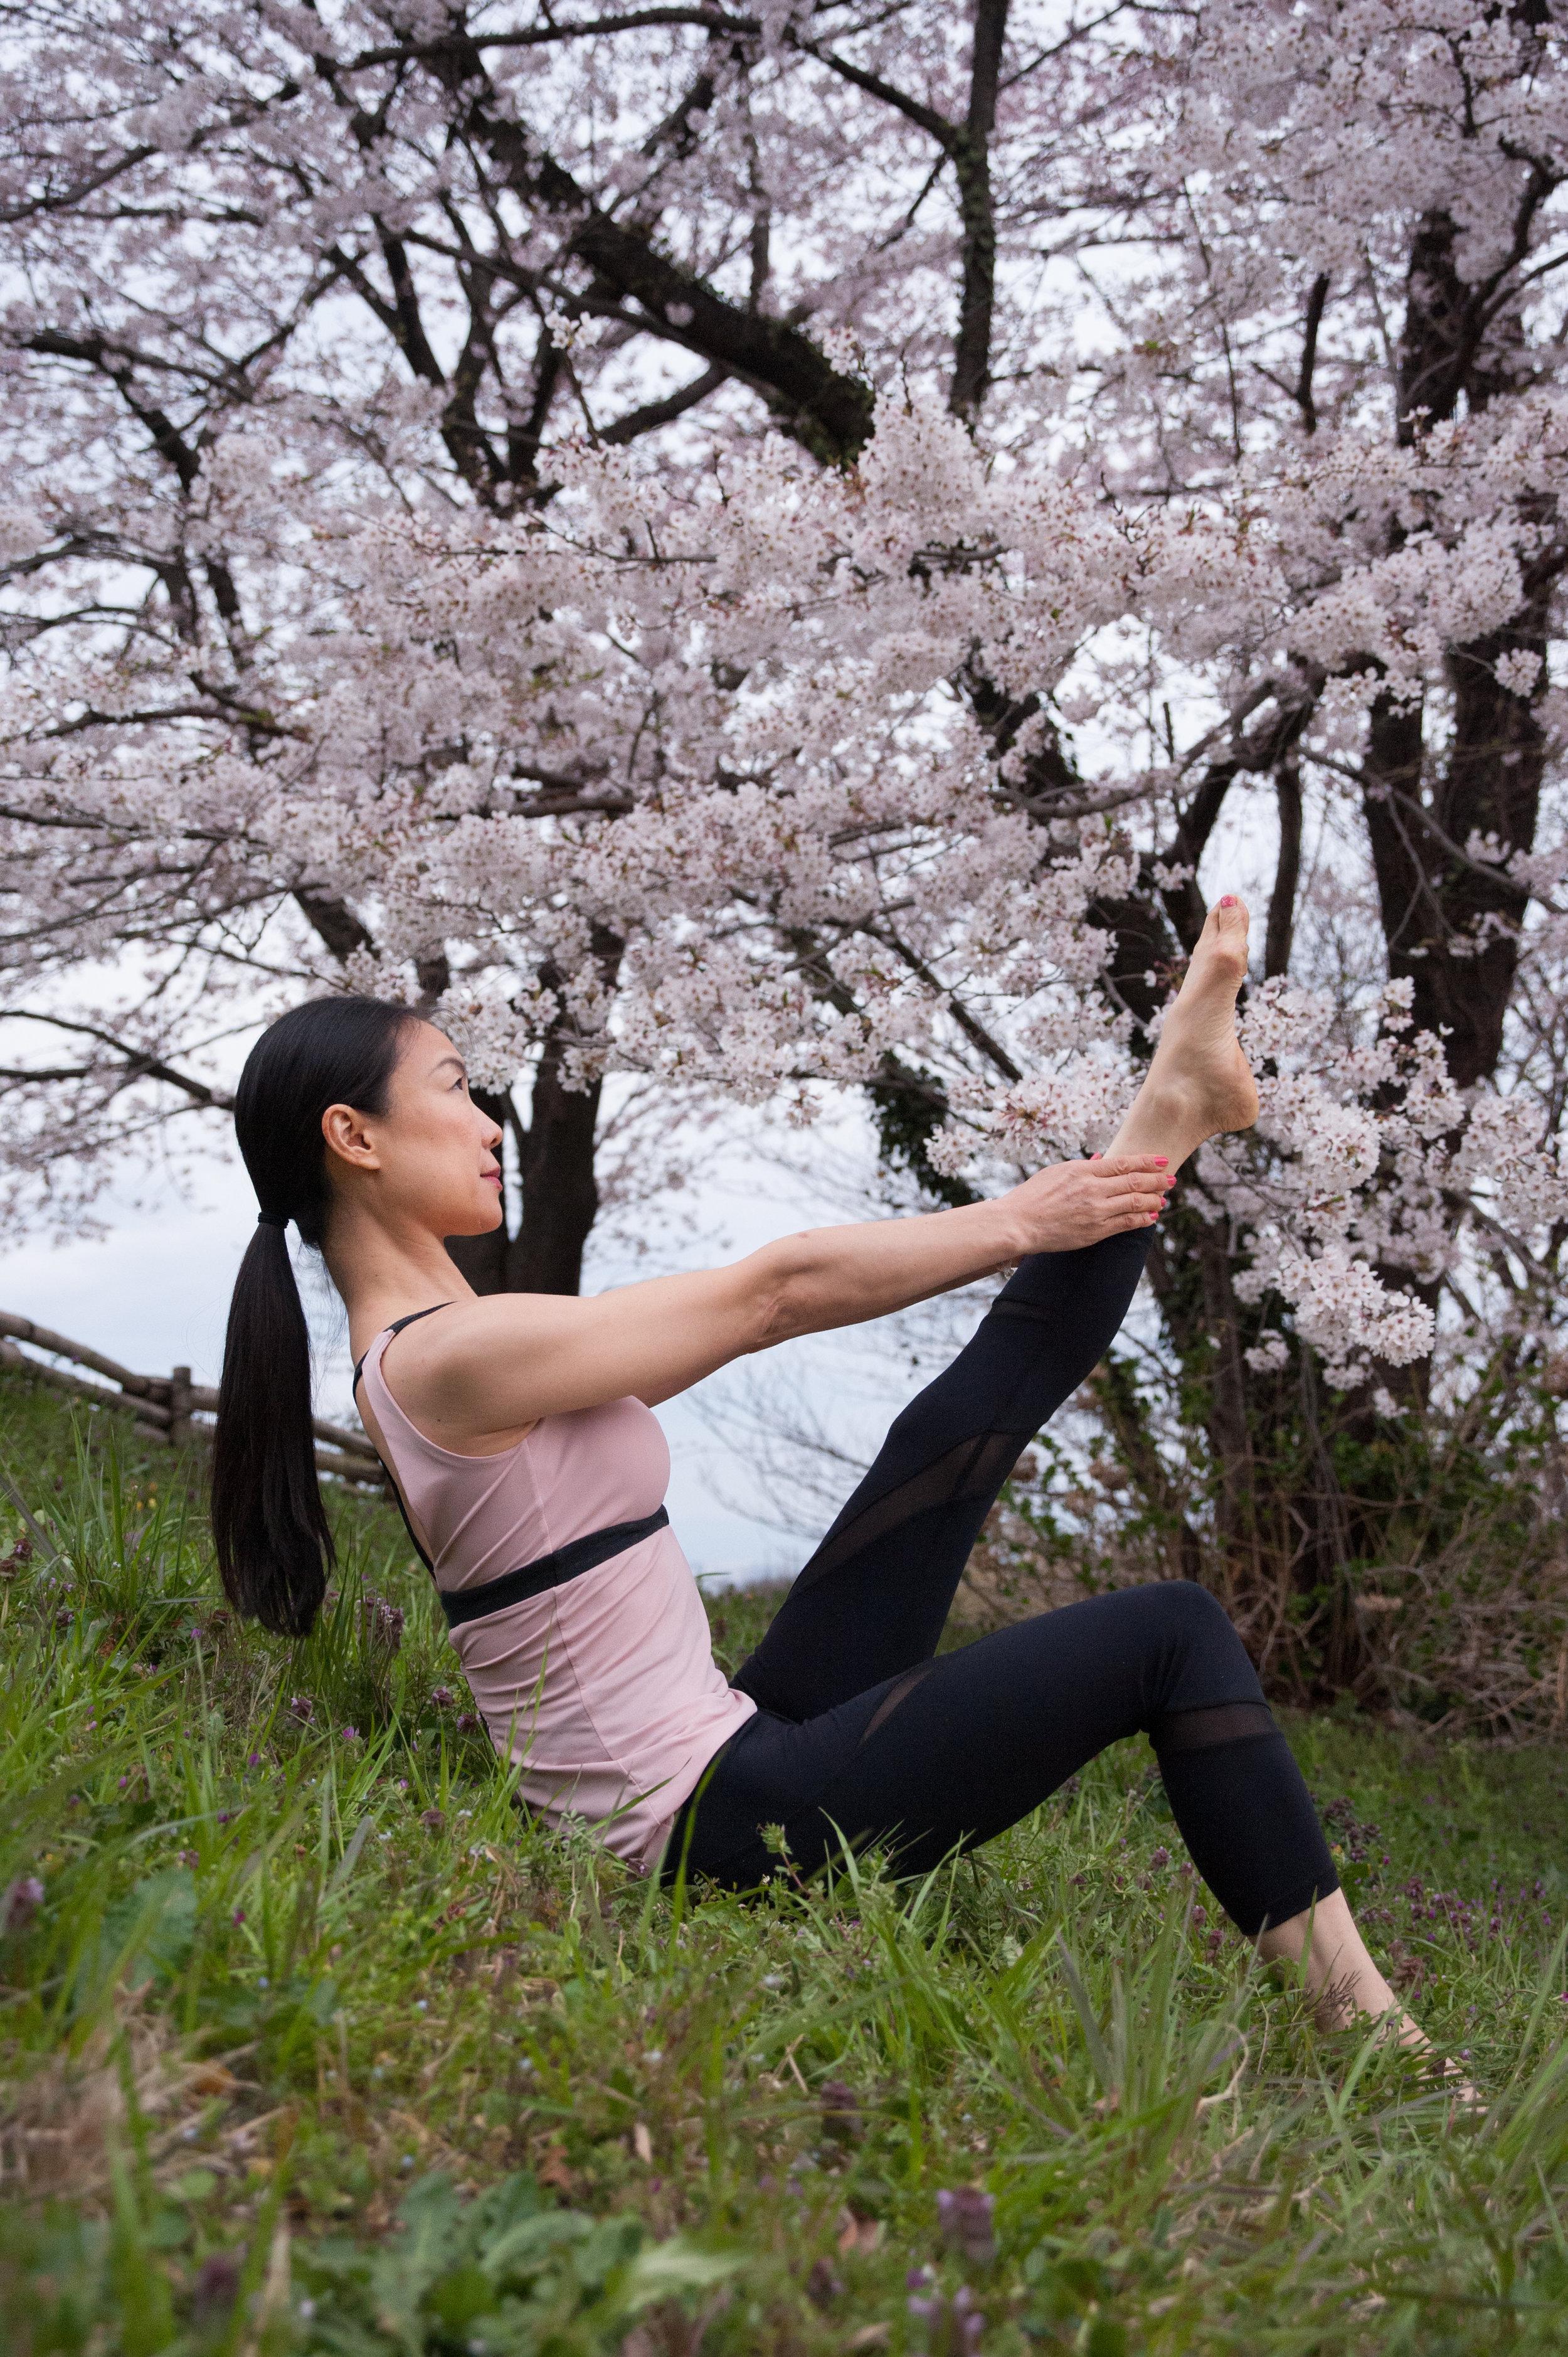 Sakura One leg Up 2535.jpg